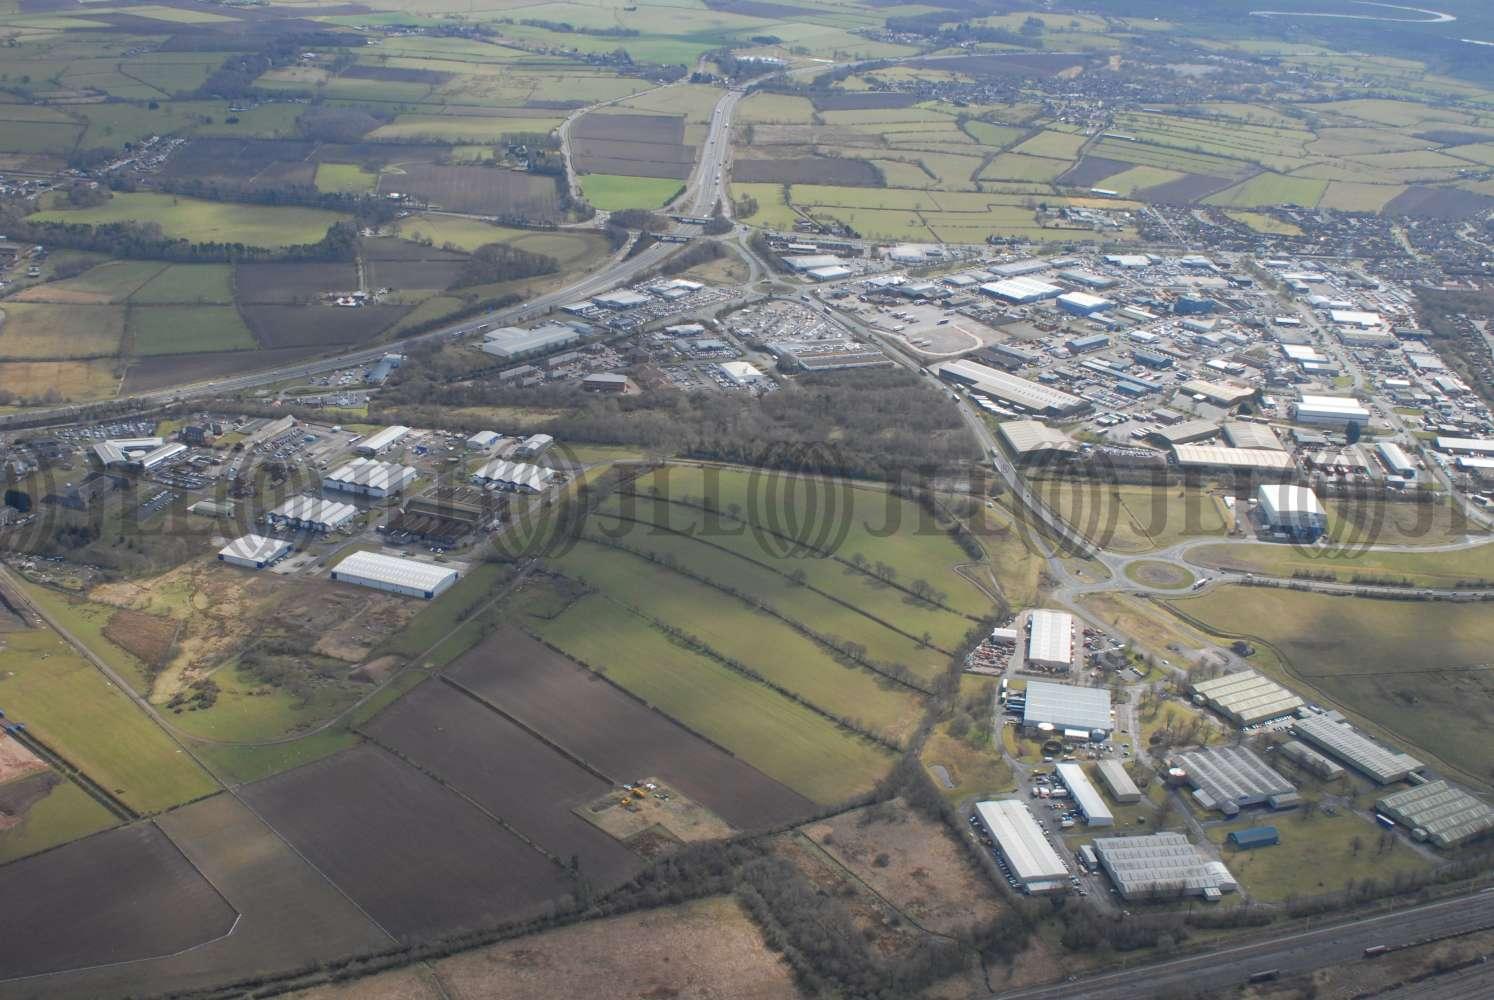 Industrial Carlisle, CA6 4BA - Kingmoor Park - 23014